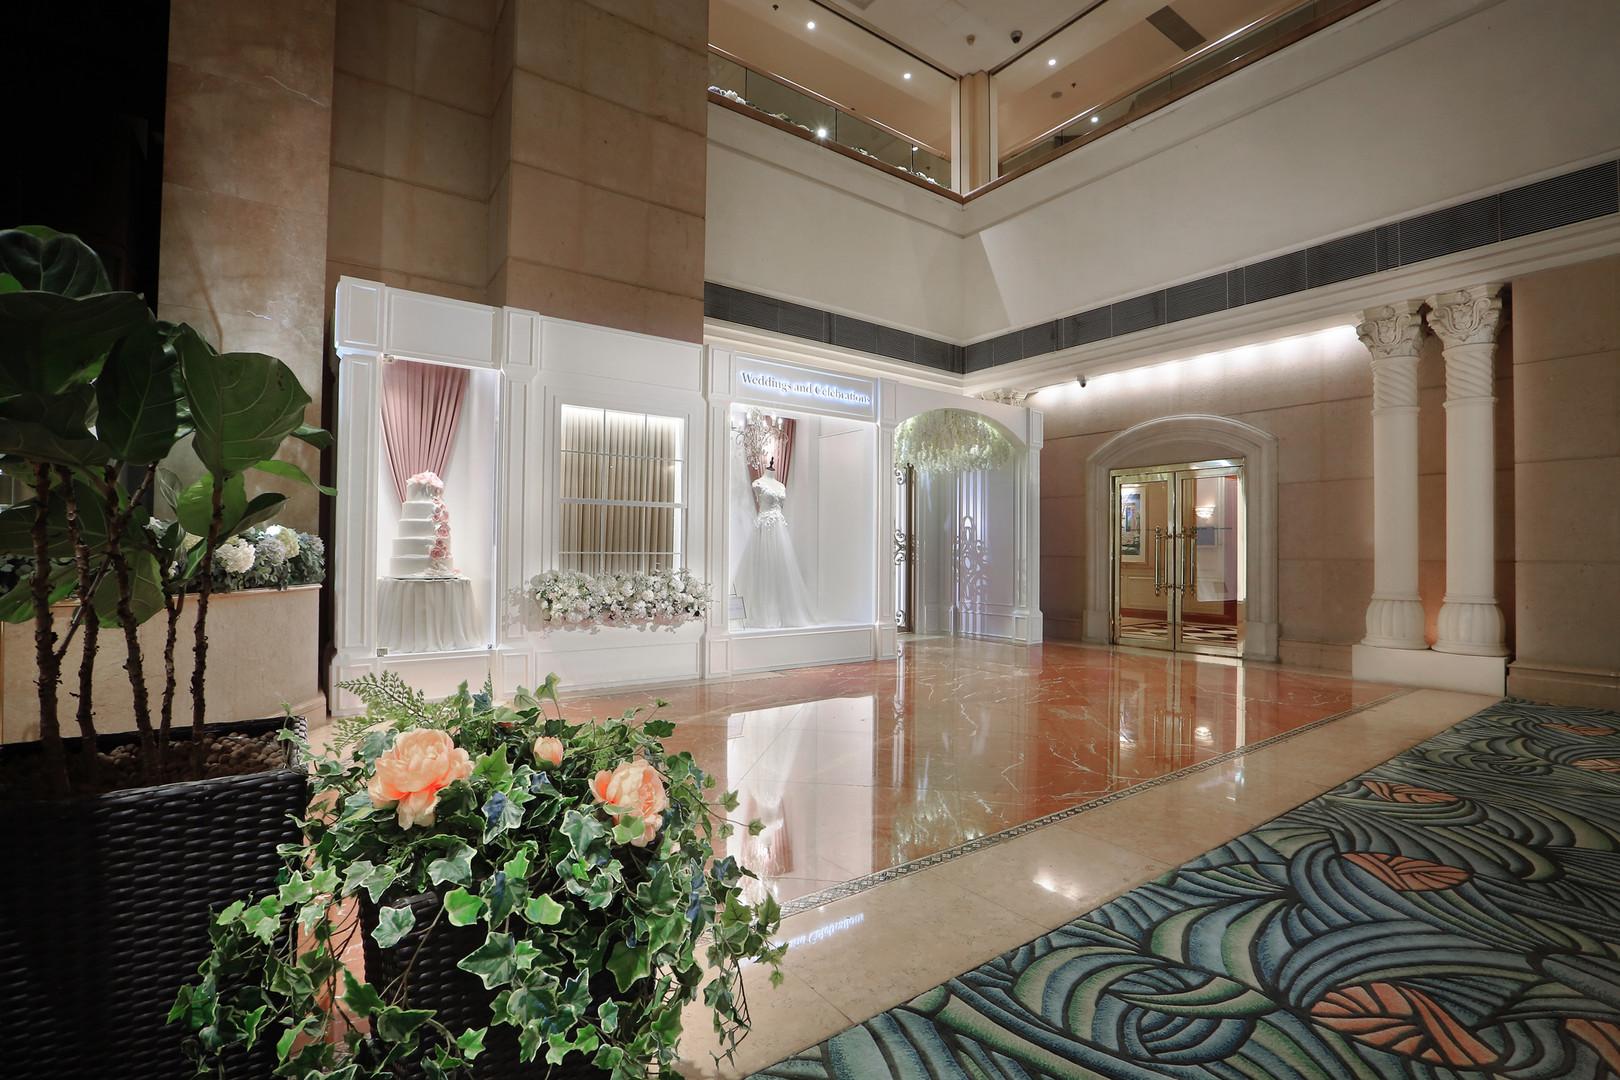 Gold Coast Hotel Interior Design and Production